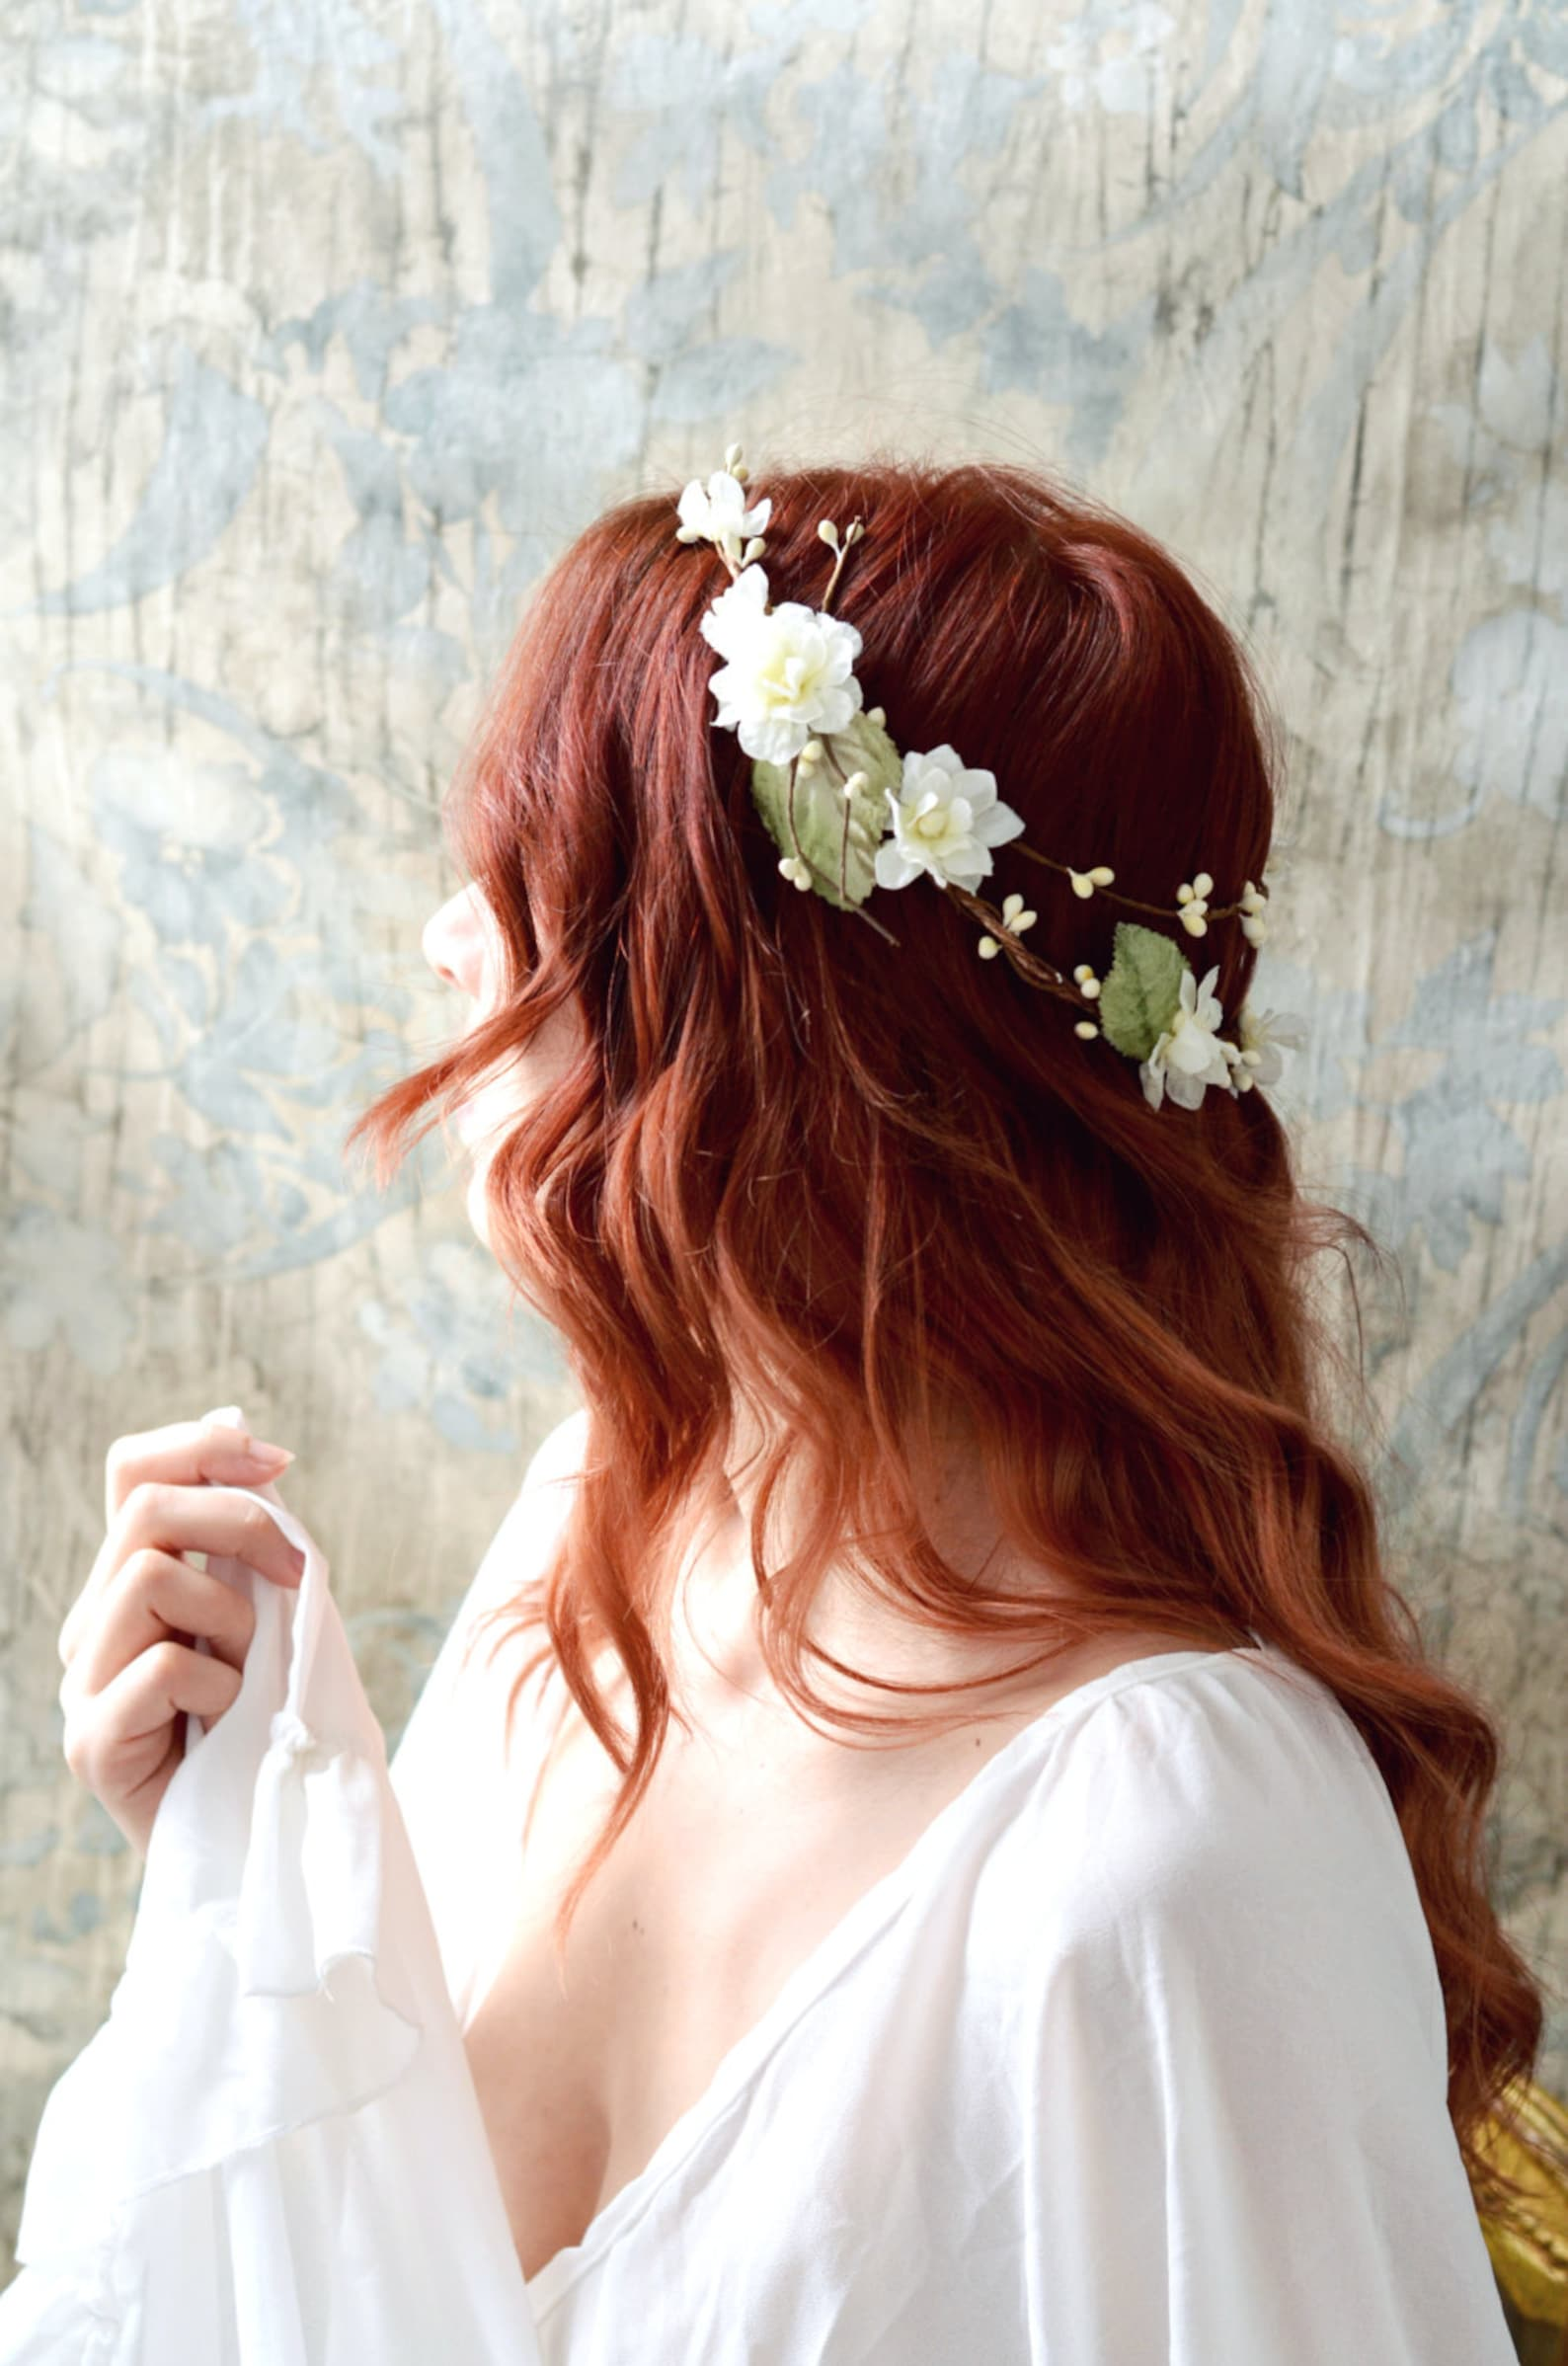 Wedding Hair Accessories Ideas for Boho Chic Brides, Rustic flower Bridal Crown Woodland Hair Wreath